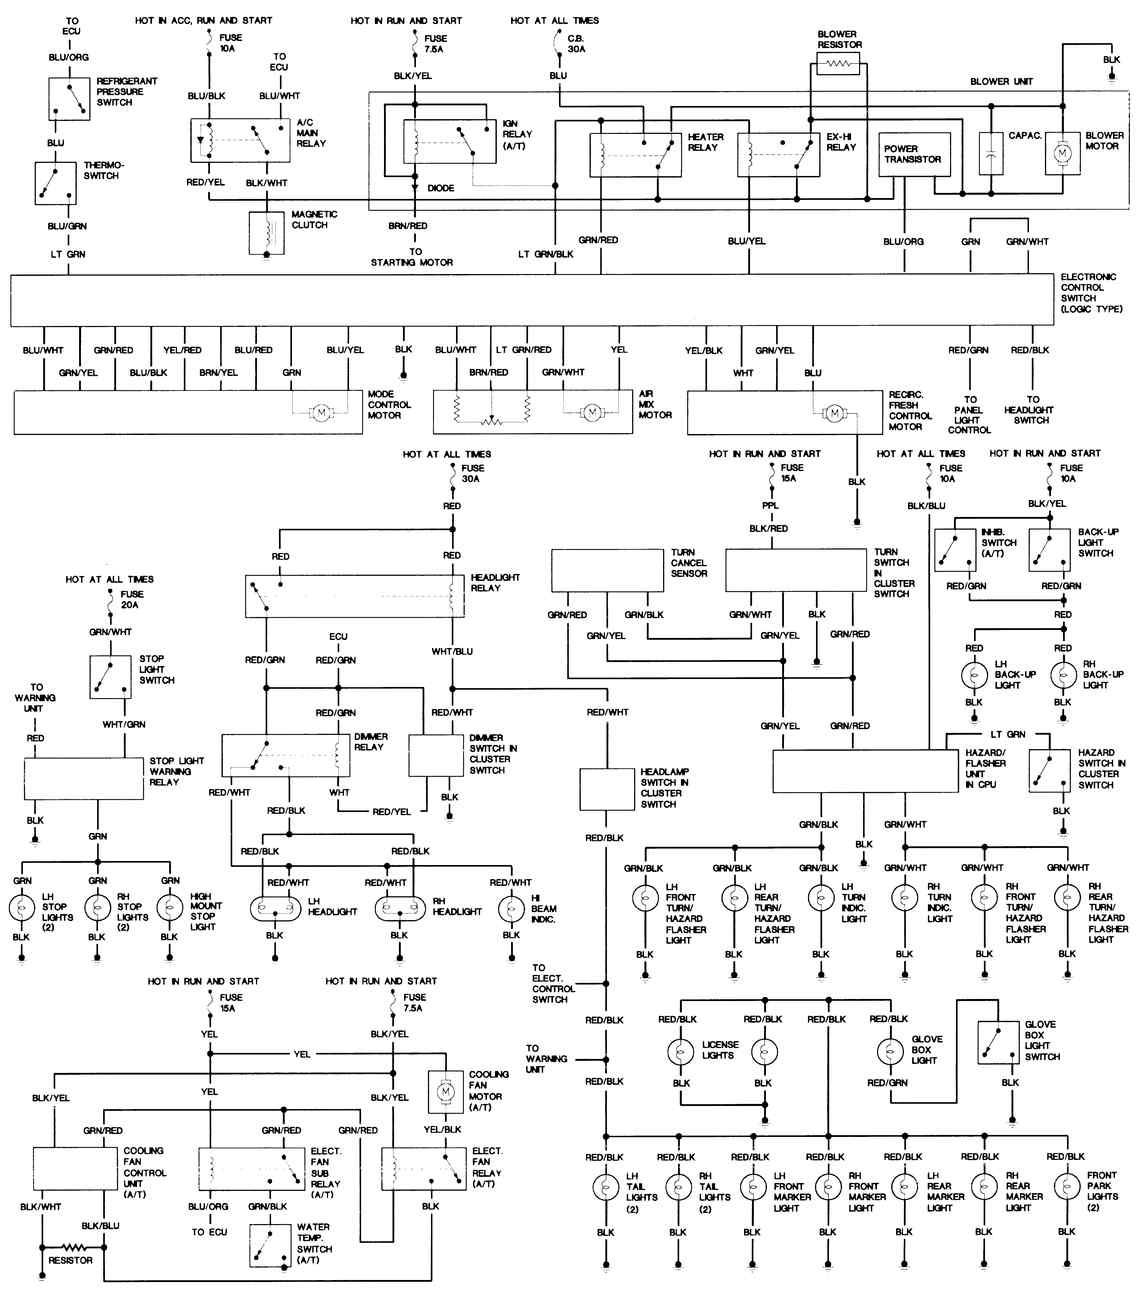 [DIAGRAM_38IS]  OS_9550] Wiring Diagram Also 1987 Mazda Rx 7 Engine Diagram On 1991 Mazda  Free Diagram | Mazda Rx 7 Wiring Schematic |  | Kumb Aspi Bocep Mohammedshrine Librar Wiring 101